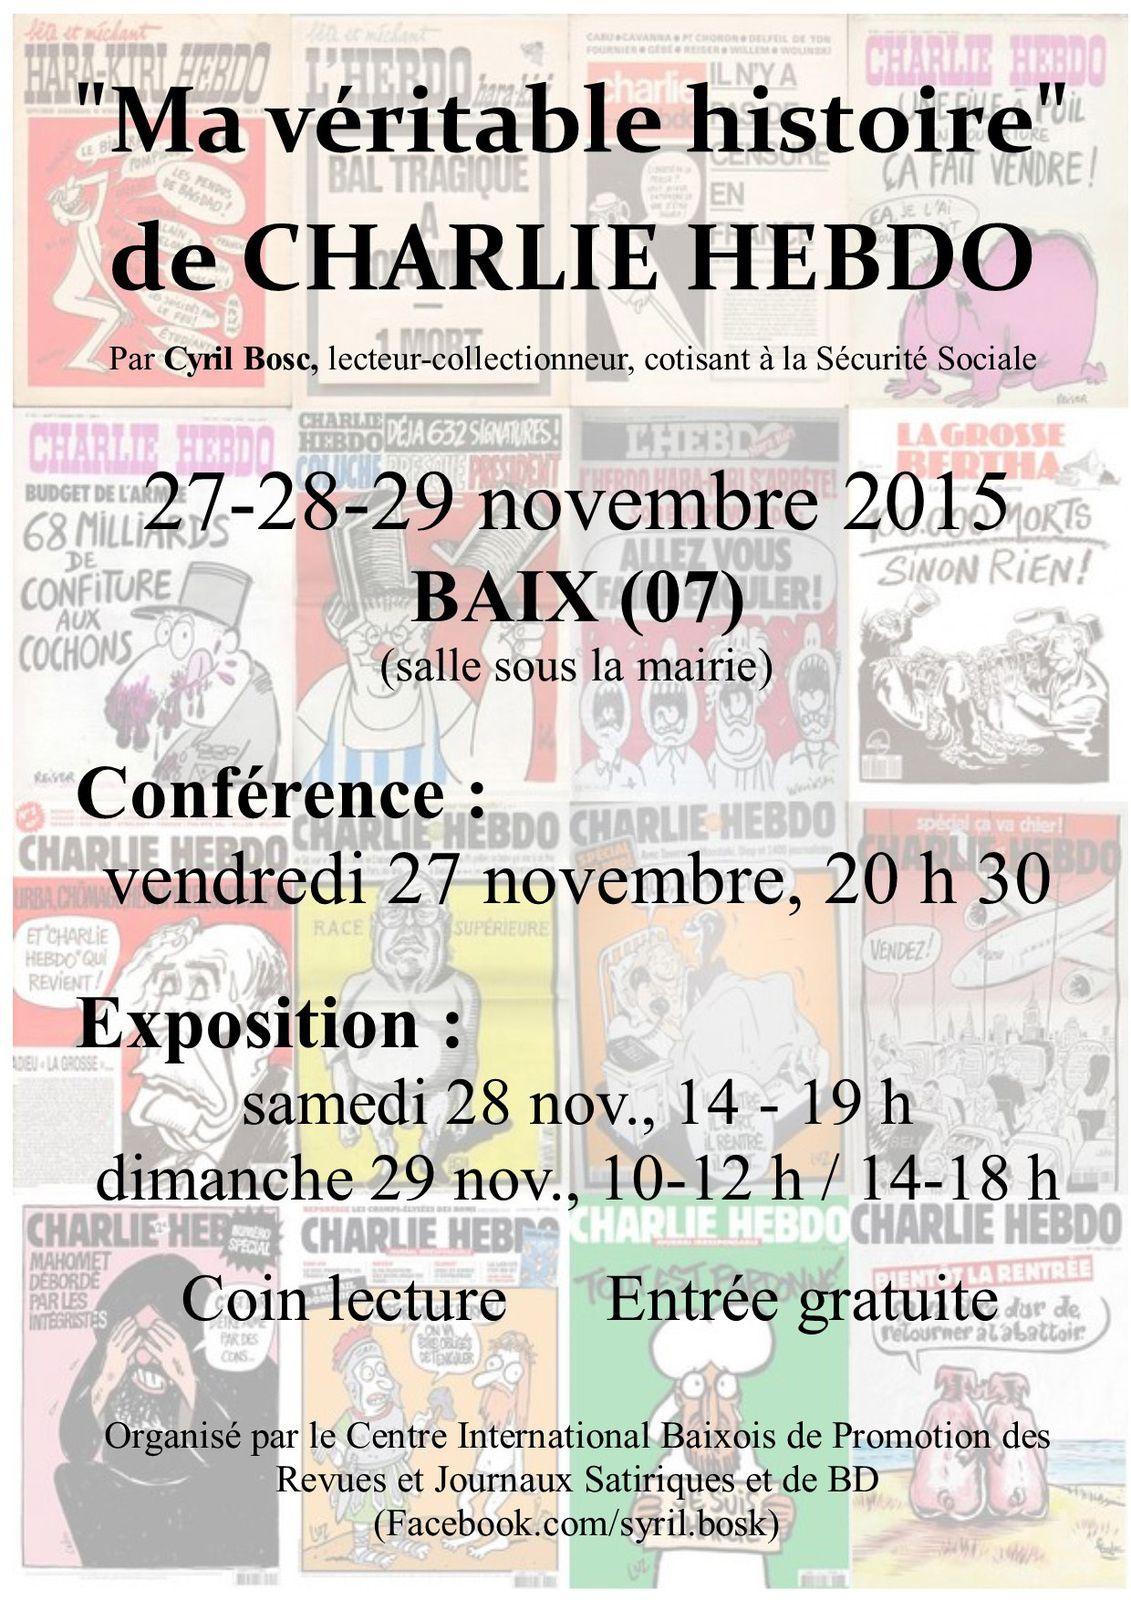 MA VERITABLE HISTOIRE DE CHARLIE HEBDO : expo et conférence de Cyril Bosc